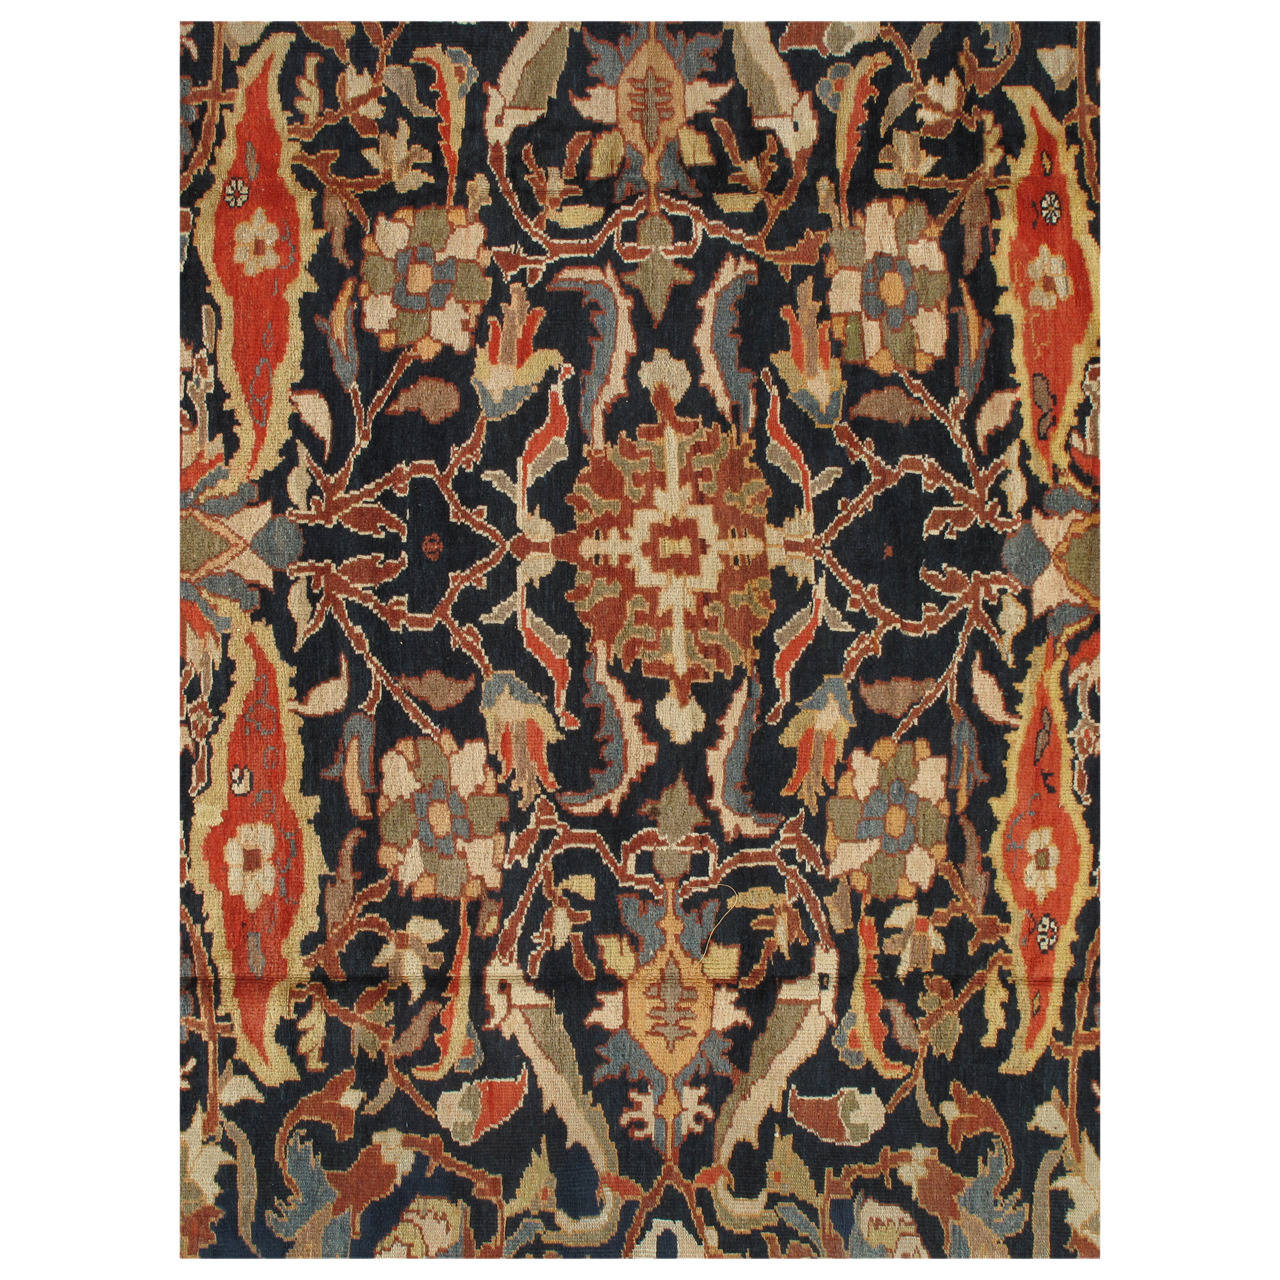 Antique Persian Sultanabad Carpet, Handmade Oriental Rug